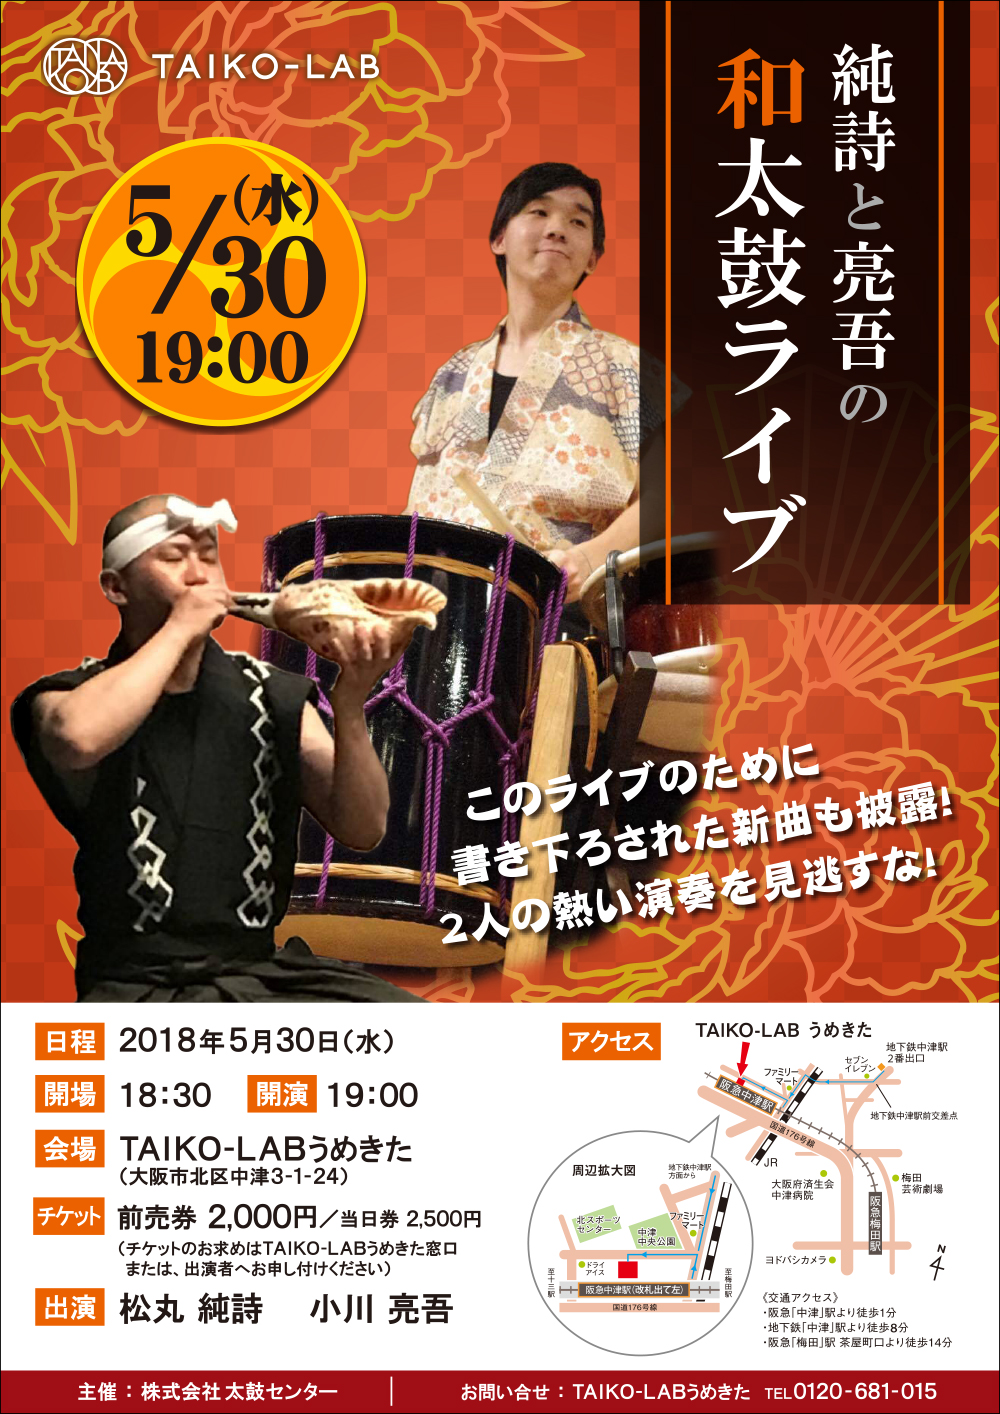 Junshi and Ryogo's Taiko Live